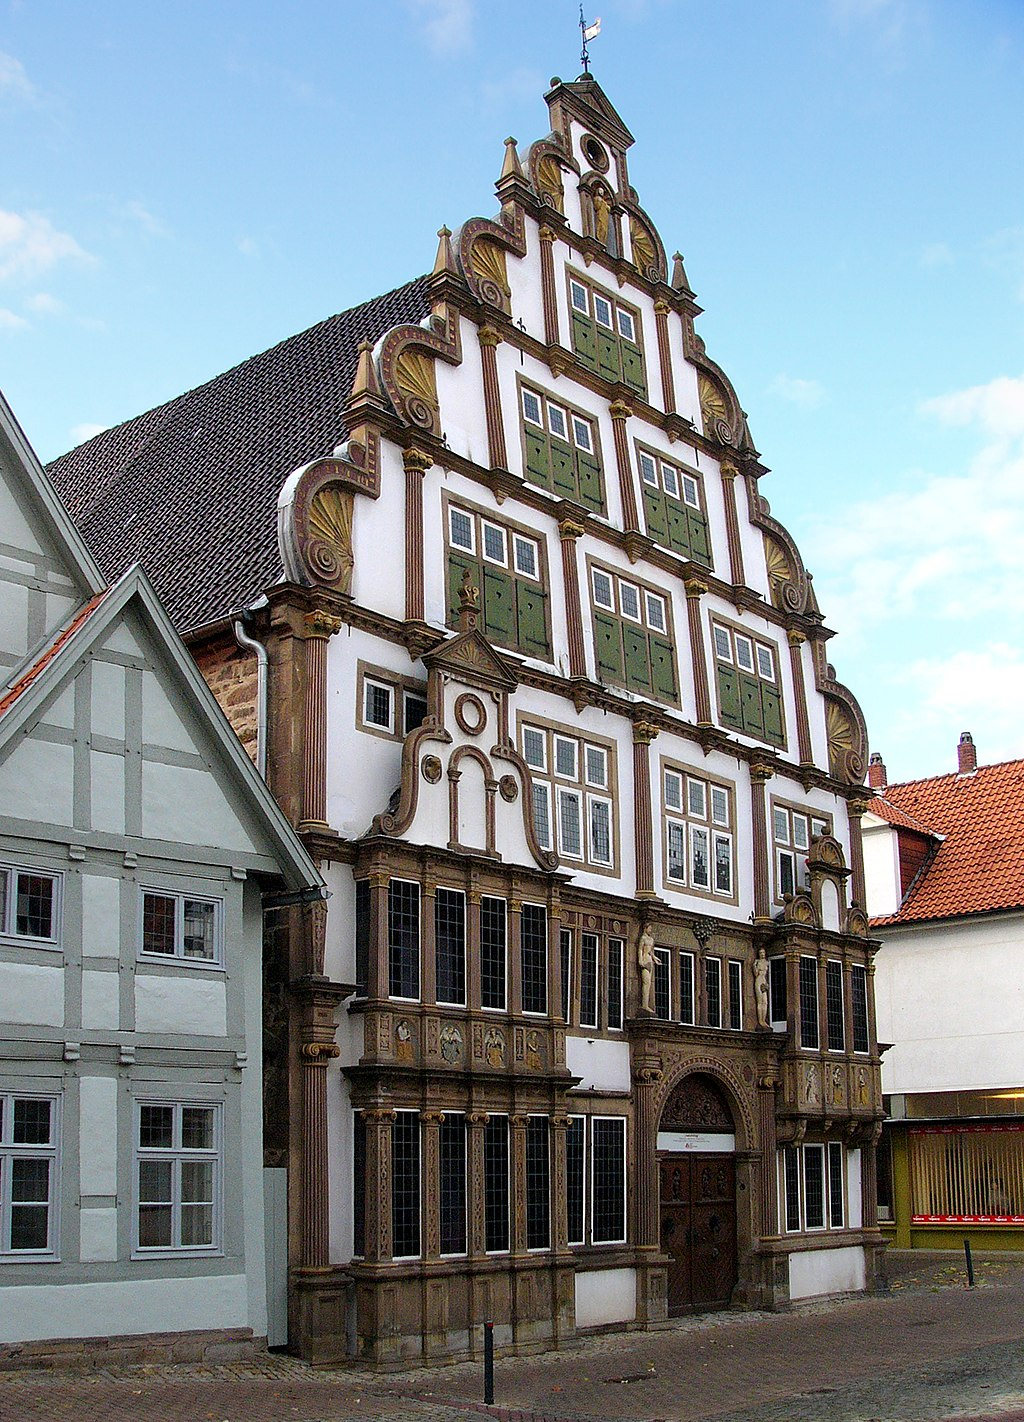 Lemgo Germany  city photo : Hexenbürgermeisterhaus in Lemgo, Germany